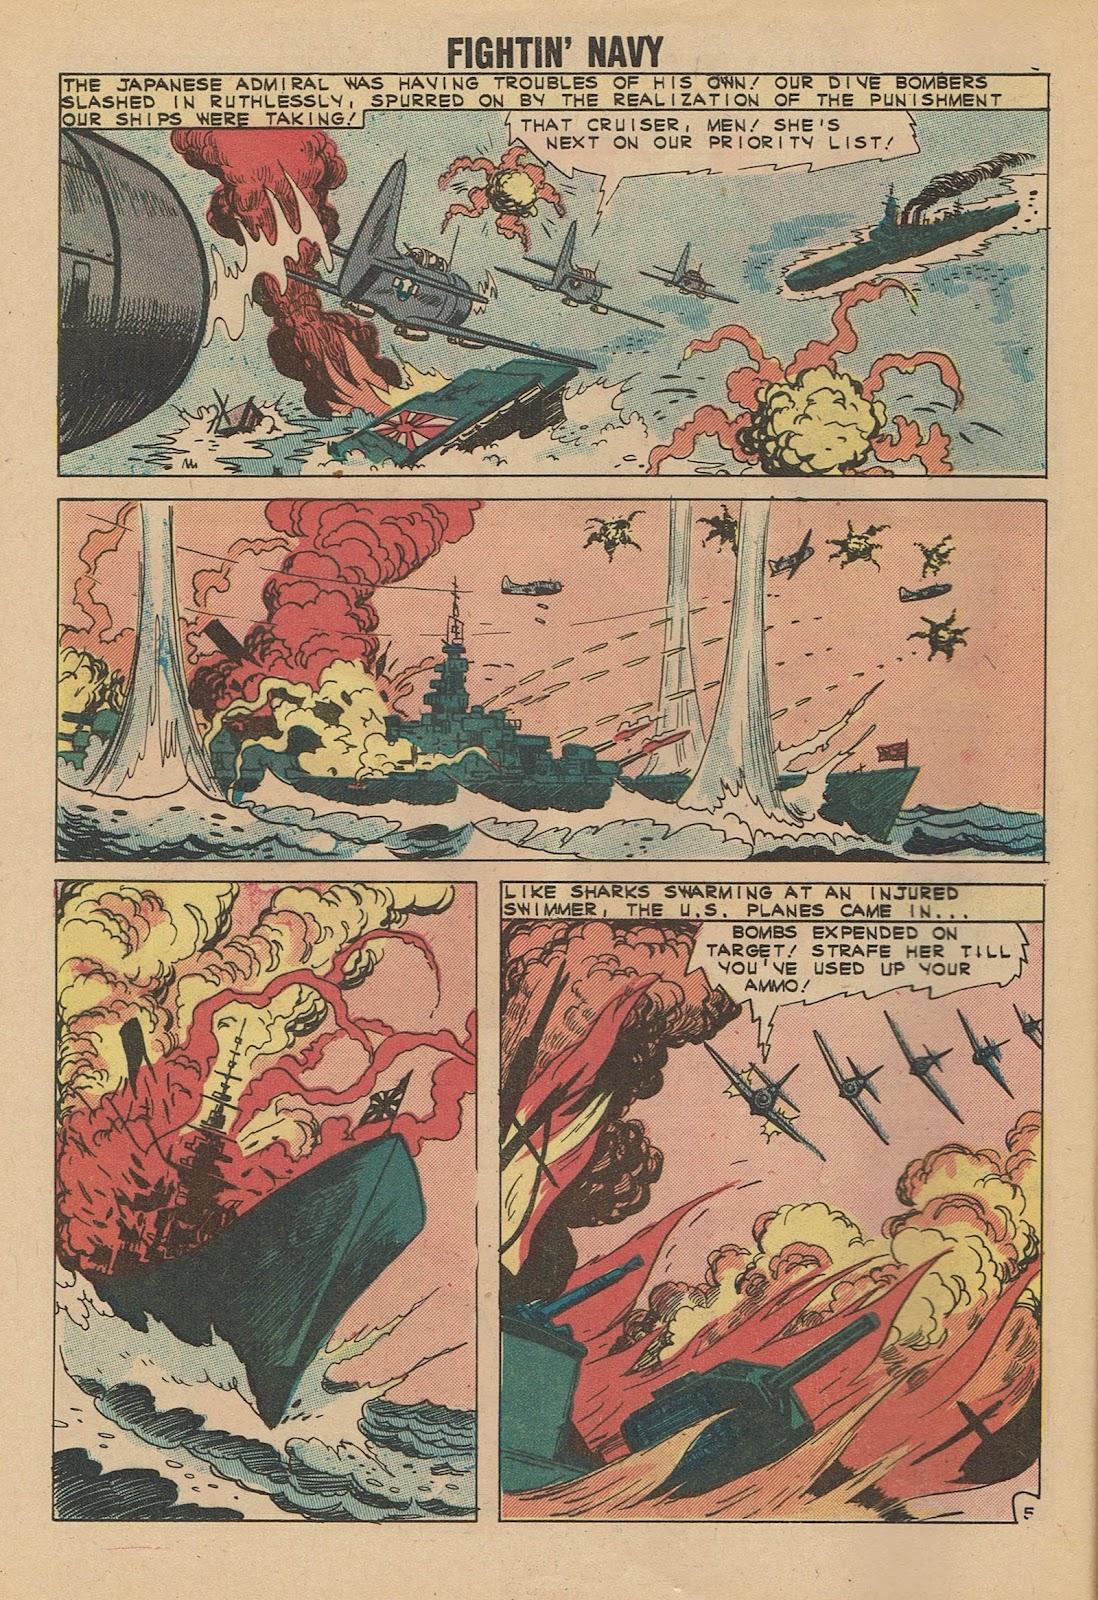 Read online Fightin' Navy comic -  Issue #101 - 8